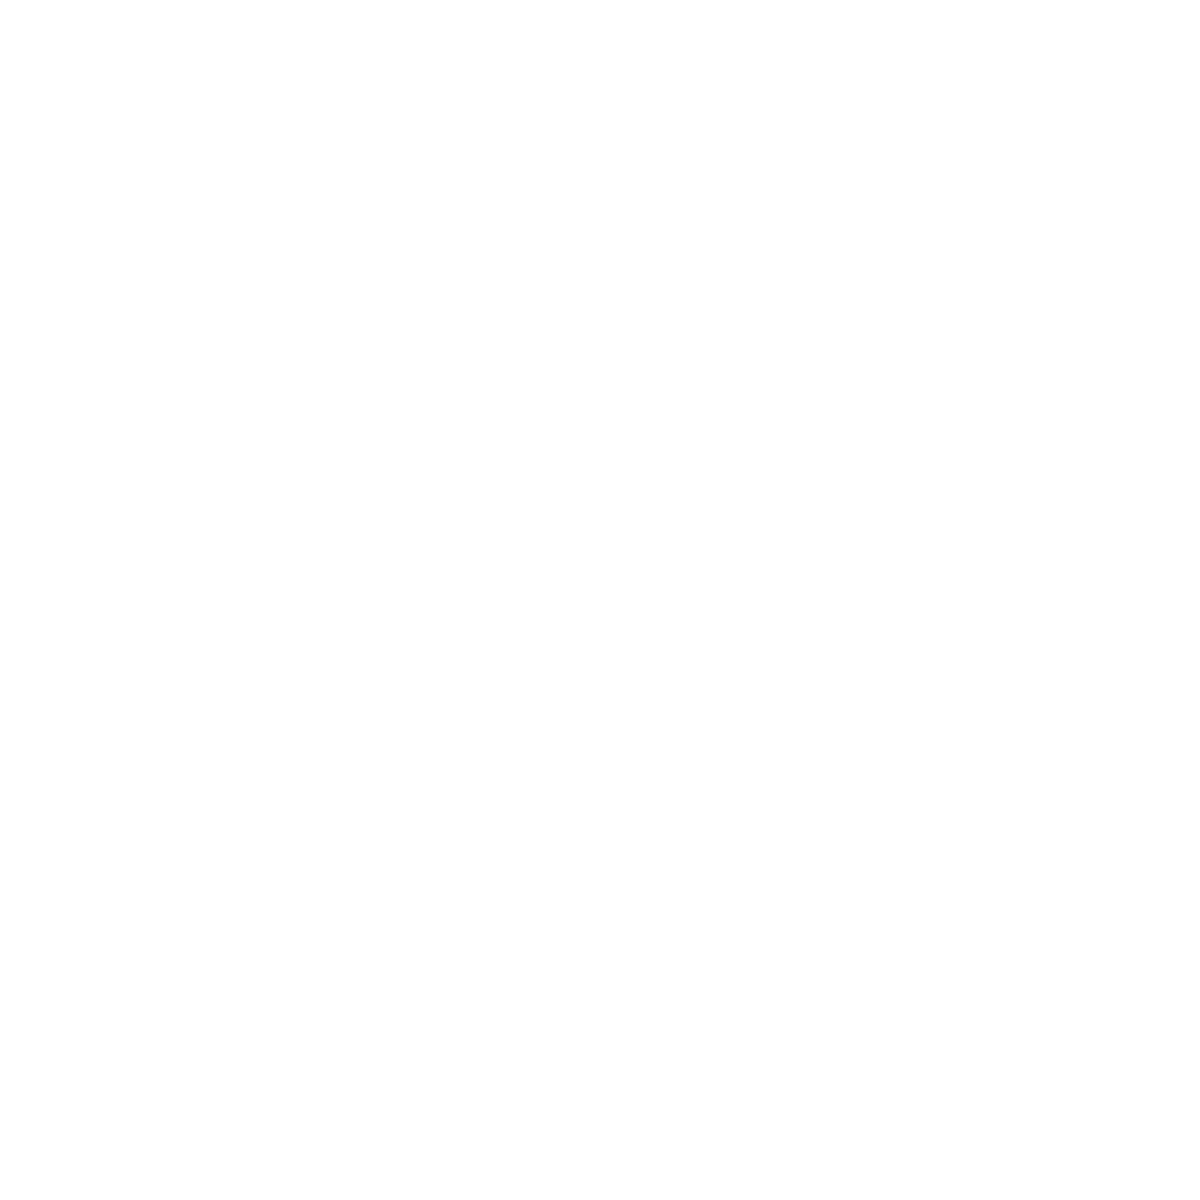 Harbor Studio LOGO